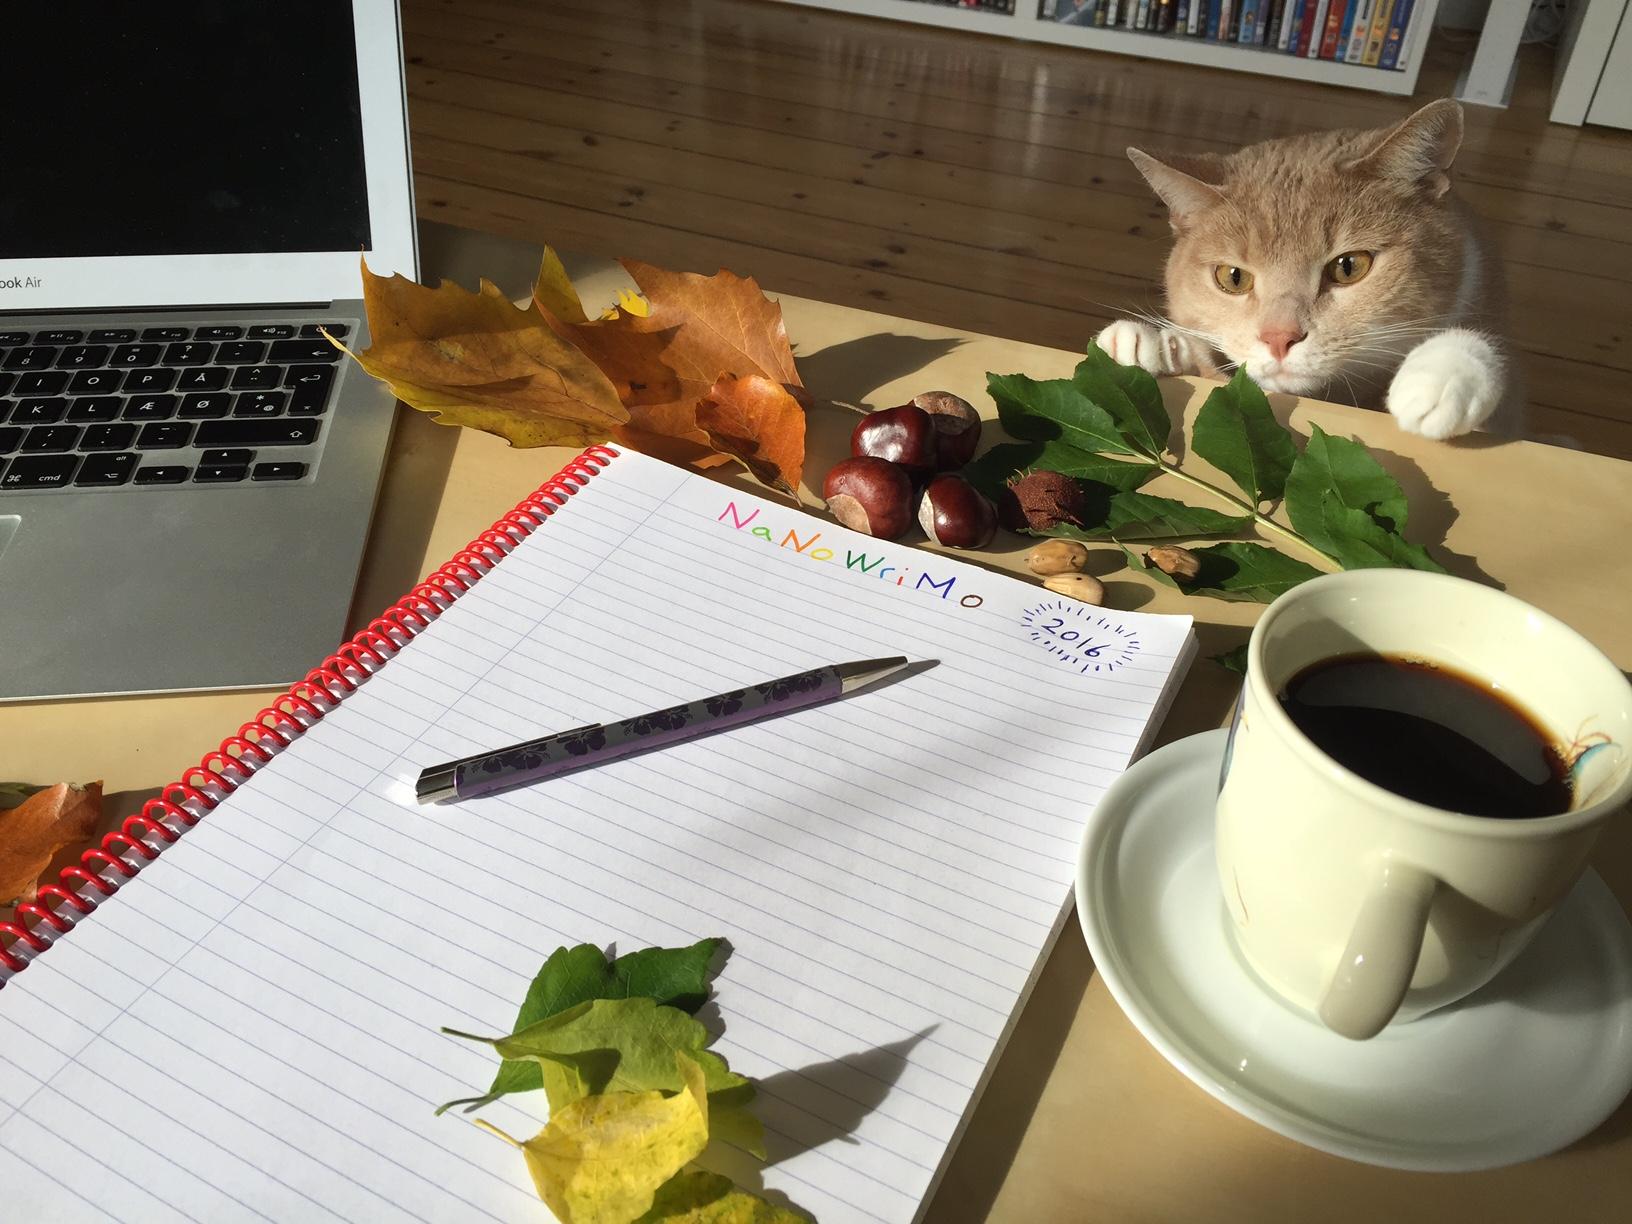 Blank blok, computer, kaffekop og kat